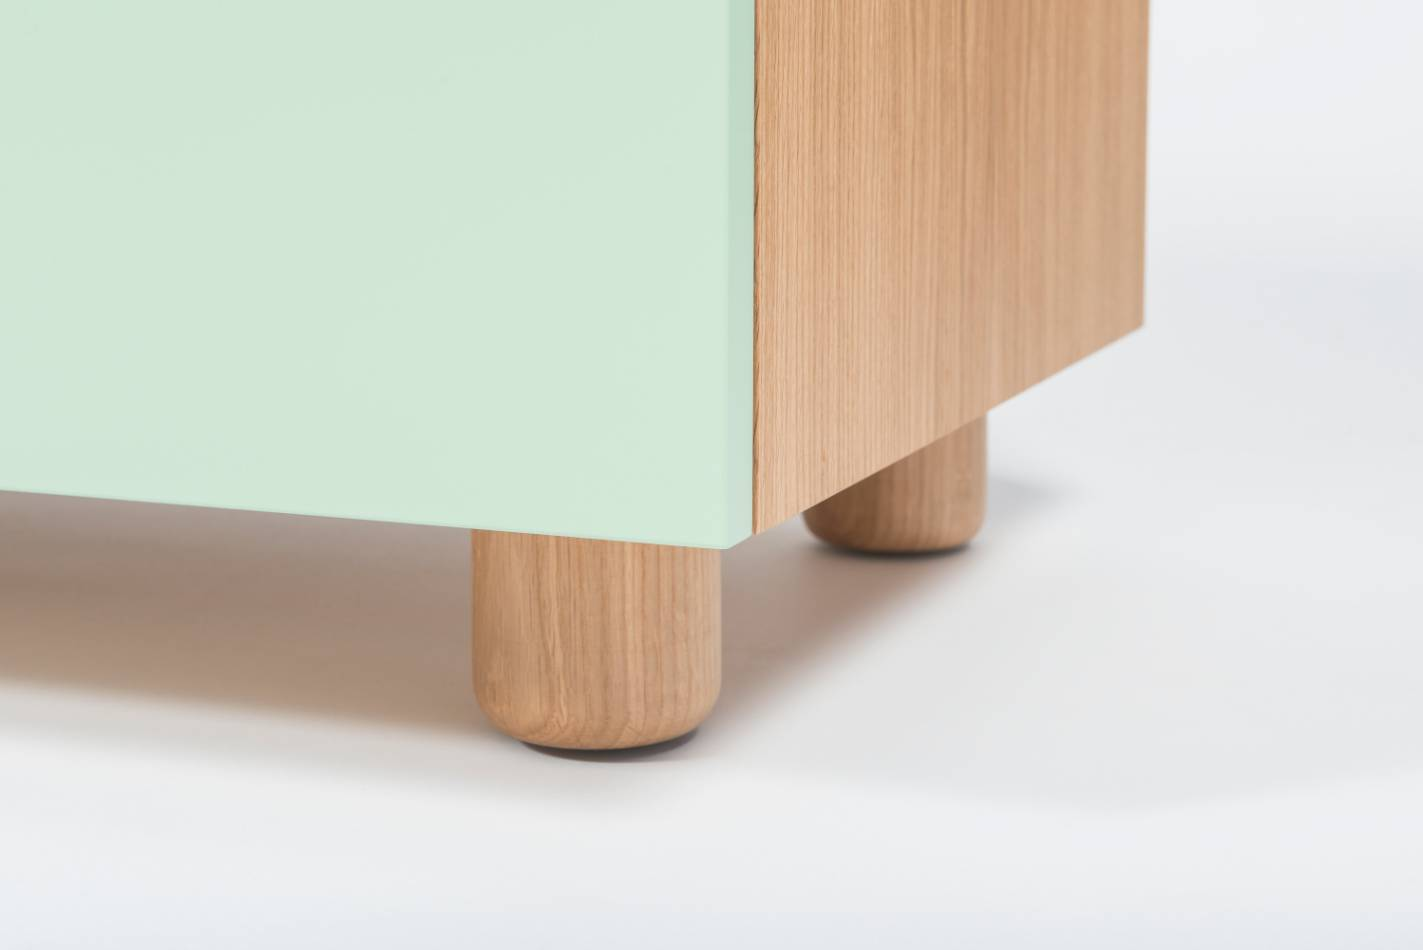 Quodes Satellite Kommode Design by Edward Barber and Jay Osgerby Design Möbel